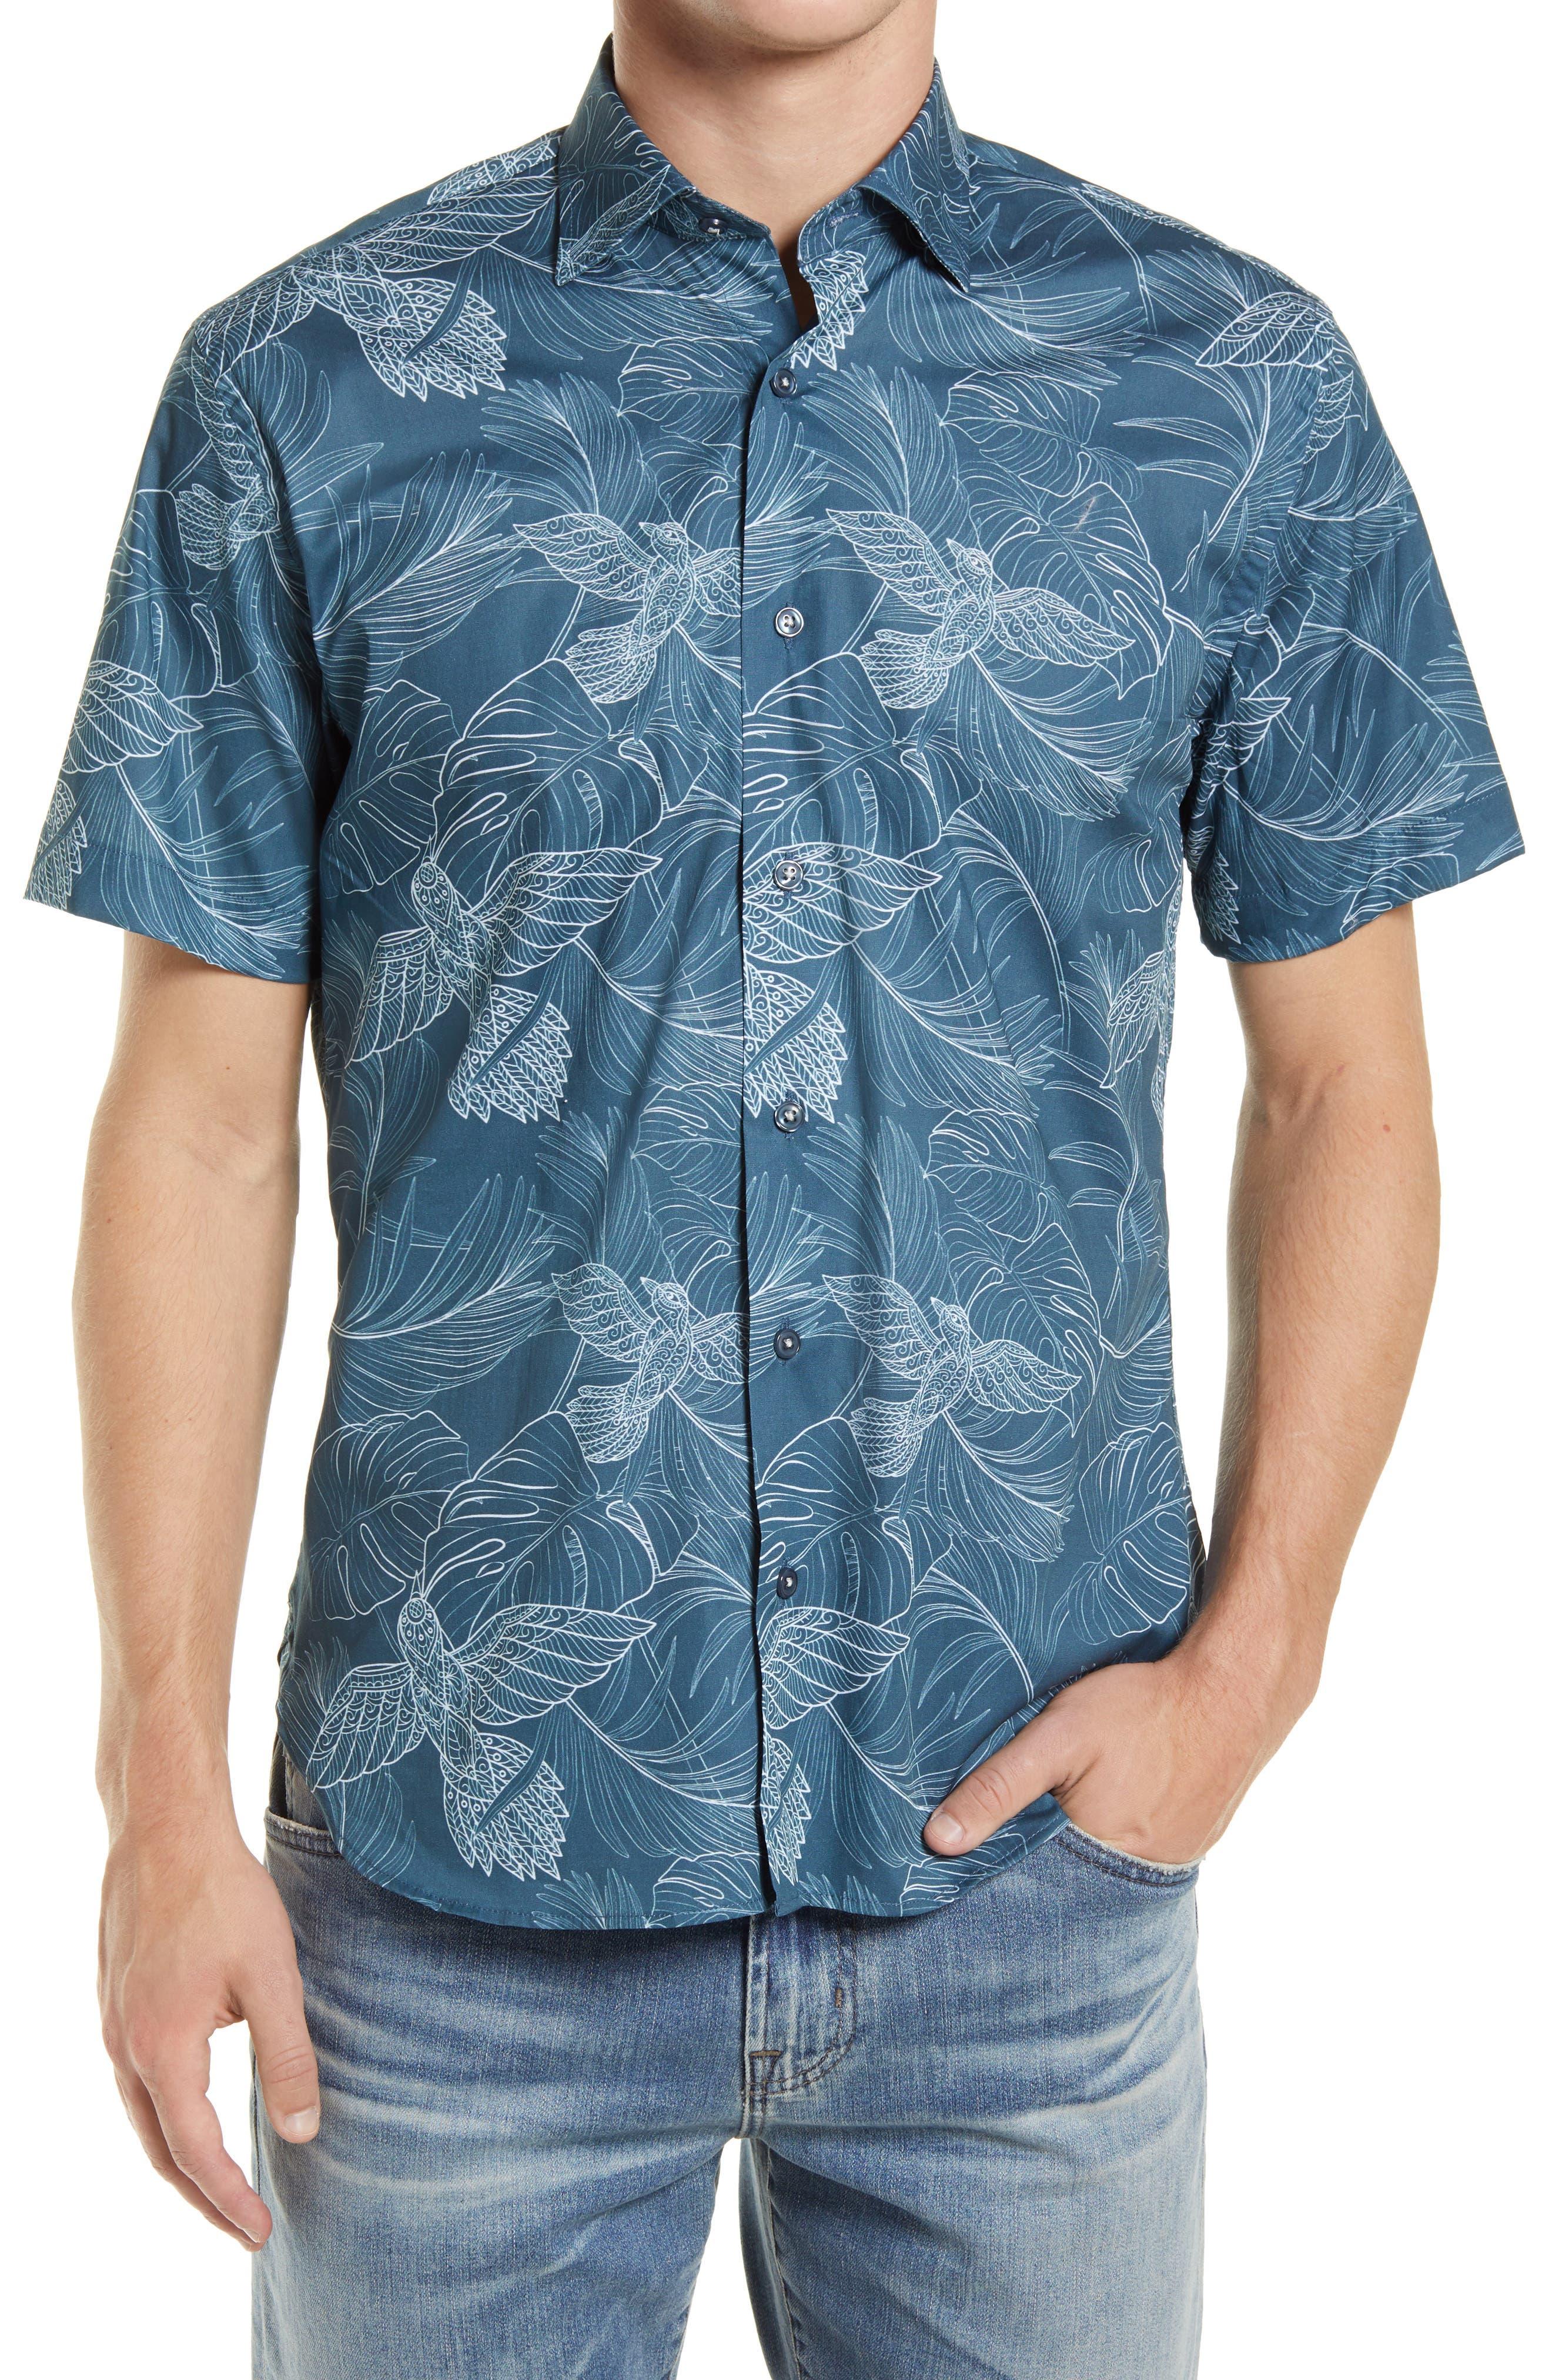 High Flying Short Sleeve Stretch Button-Up Shirt